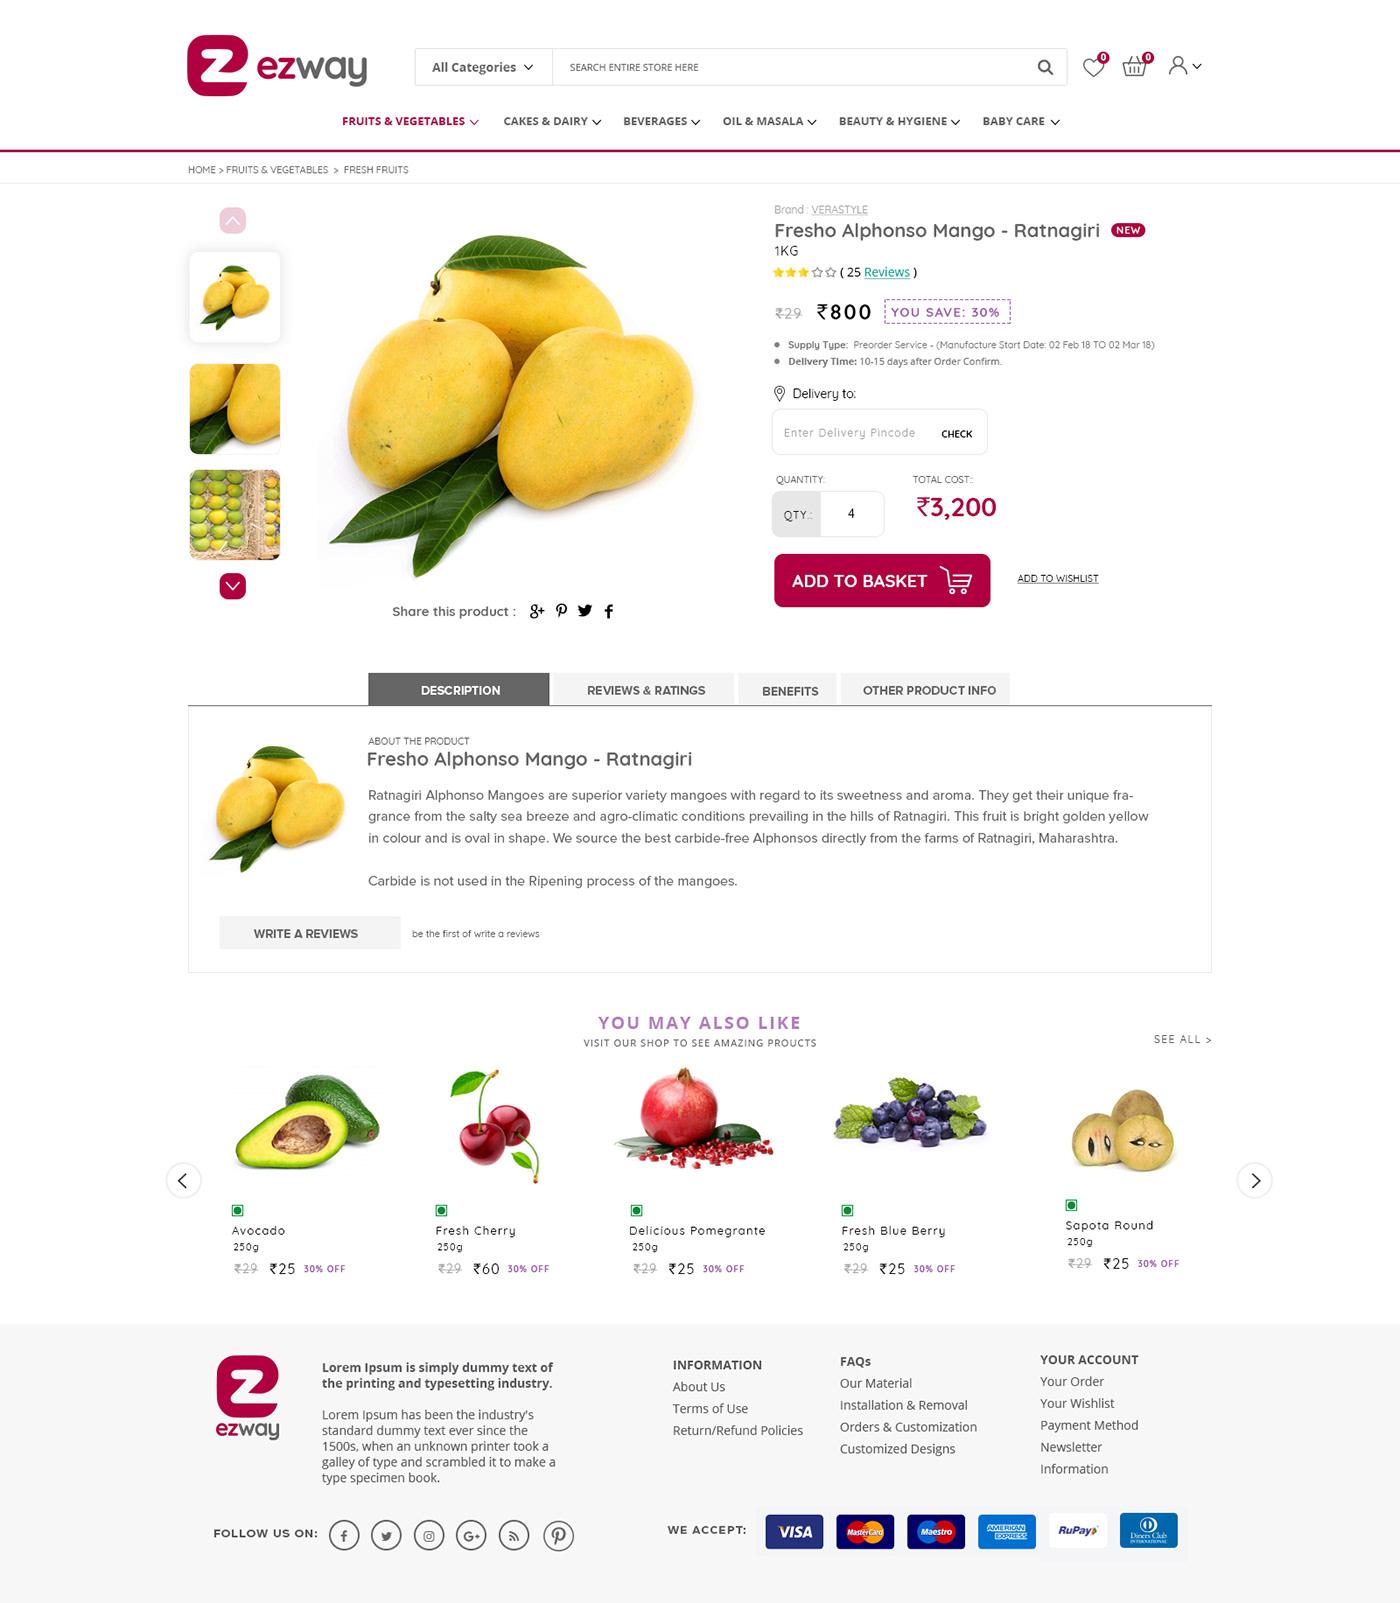 Image may contain: screenshot, abstract and fruit